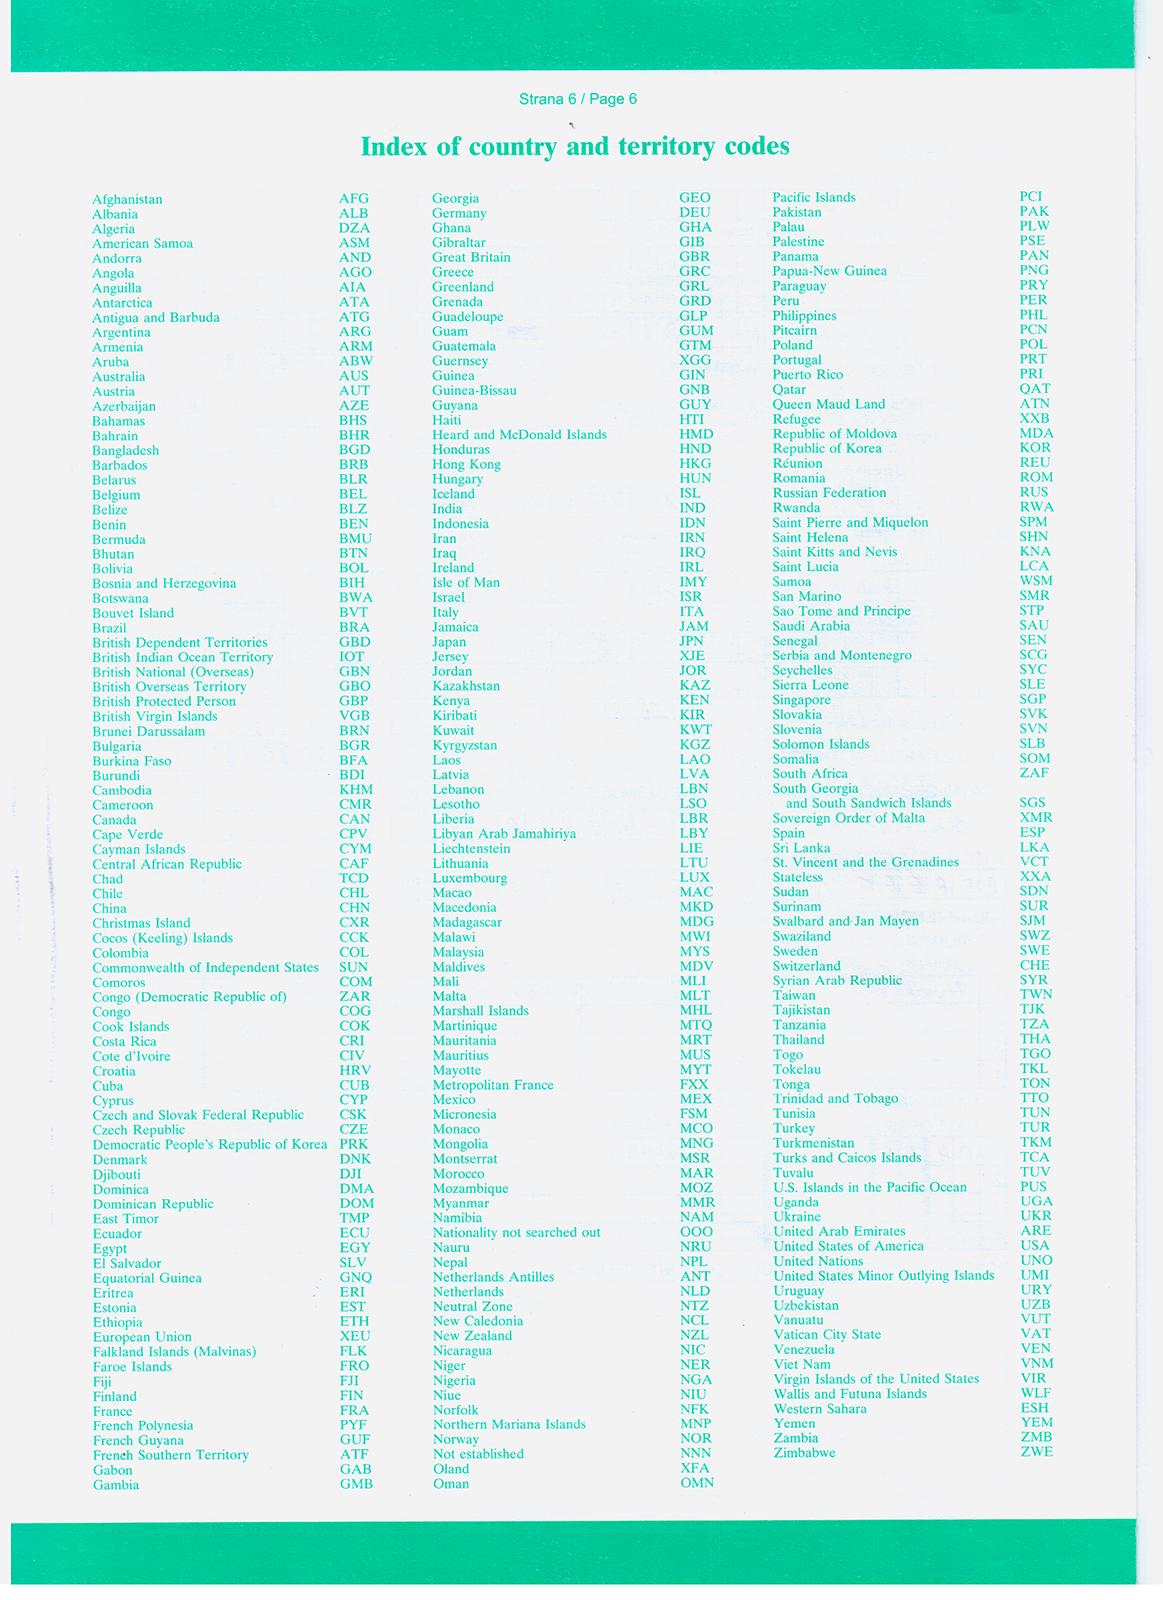 Коды государств (стран) на анкете чешского ВНЖ